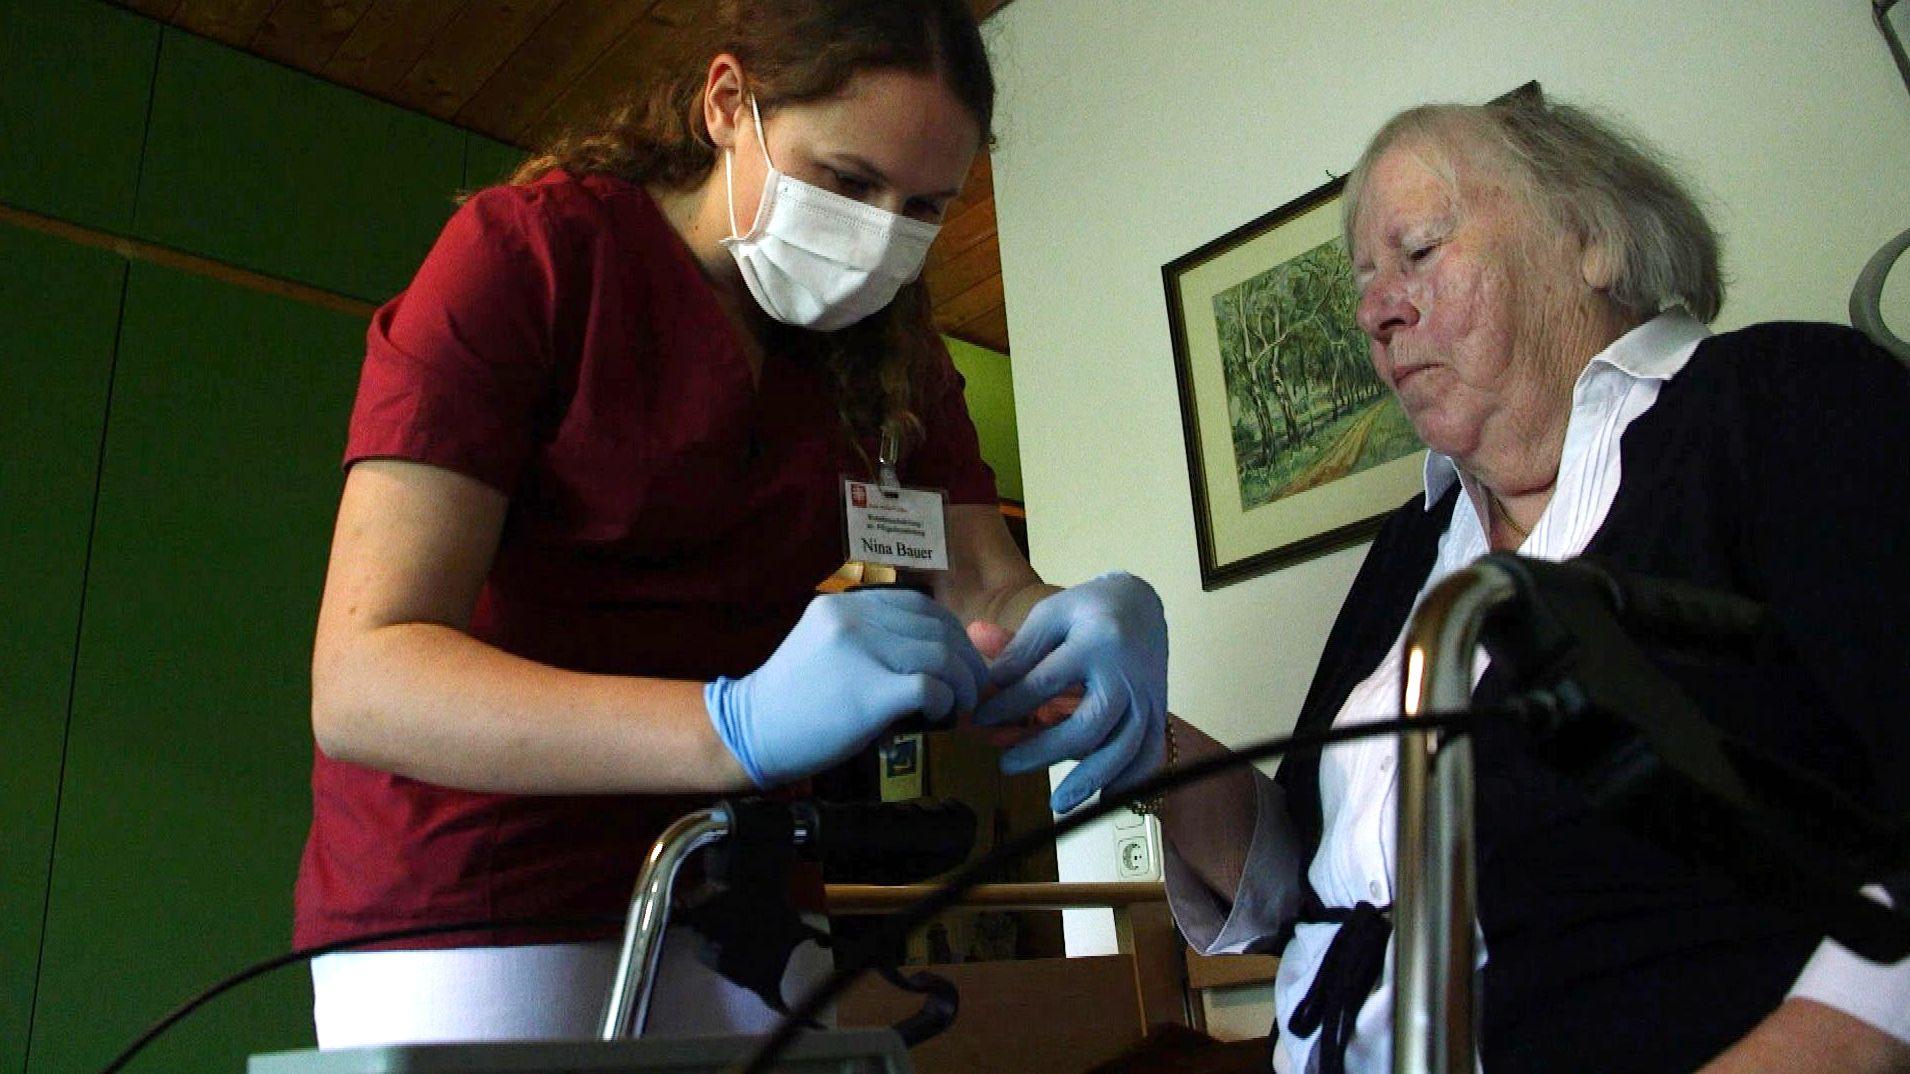 Tag der Pflege: Pflegekräfte als Helden in Corona-Zeiten